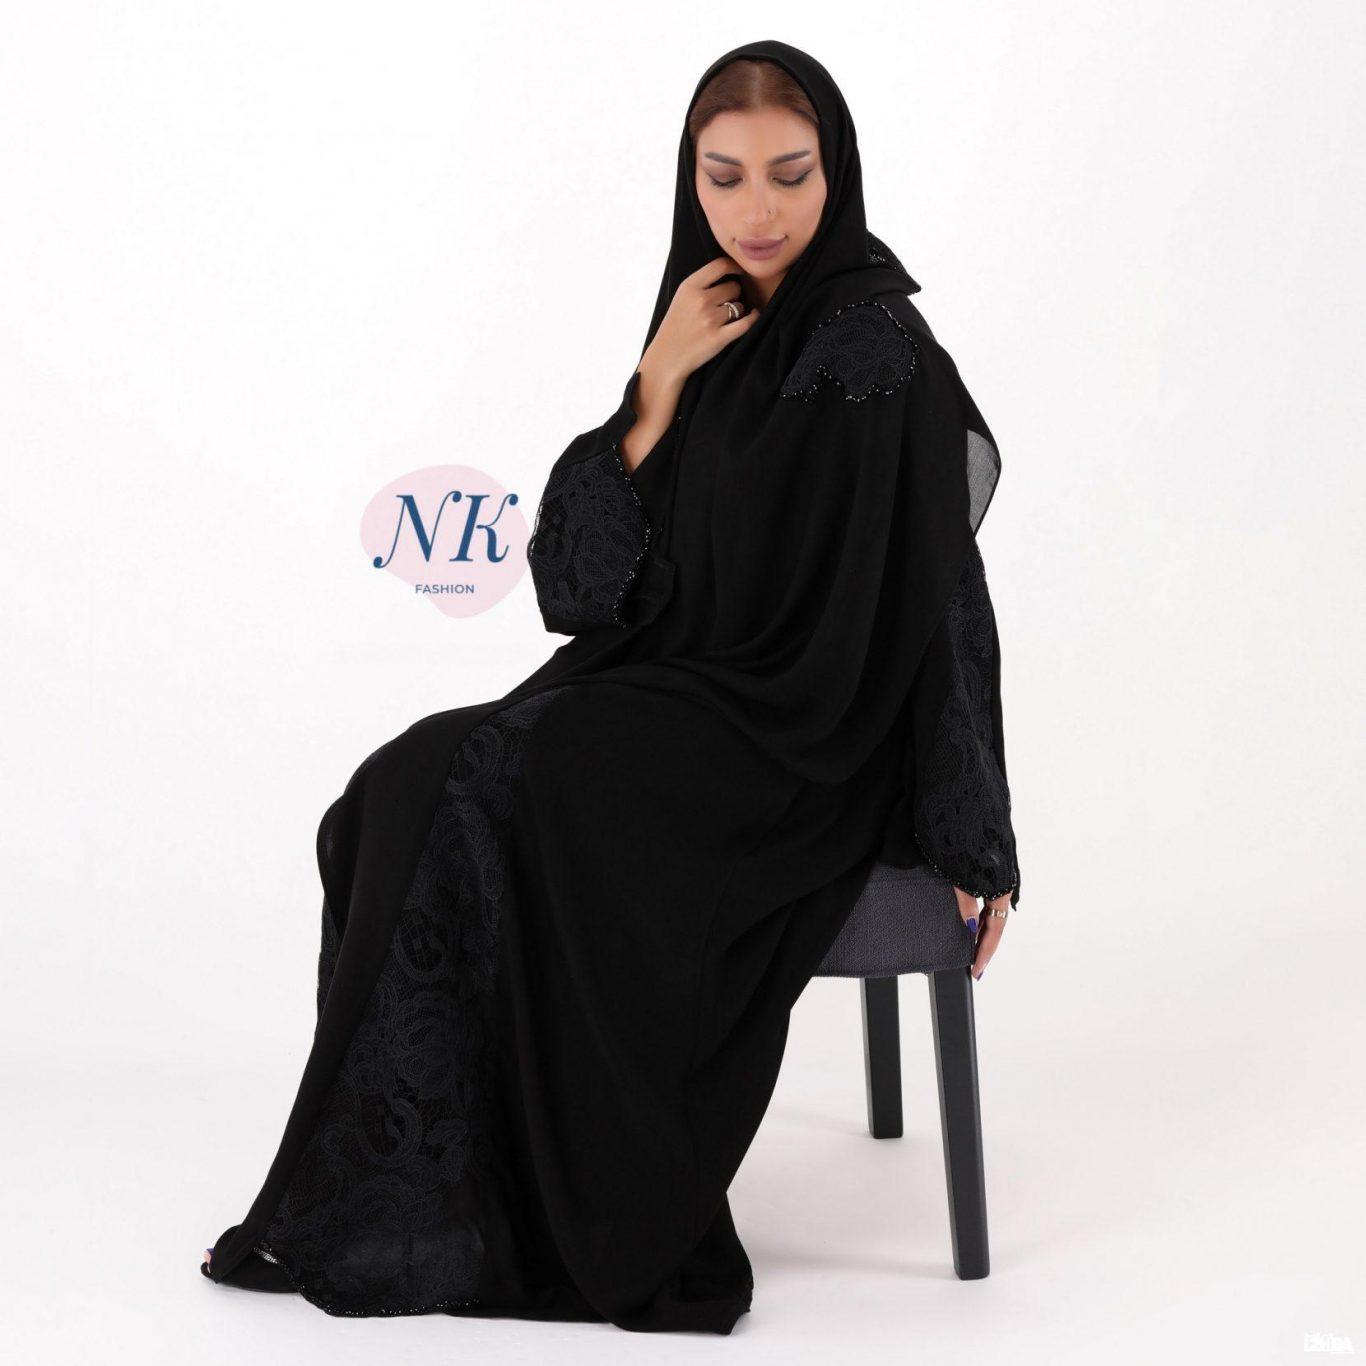 Black Abaya with a Luxury Lace